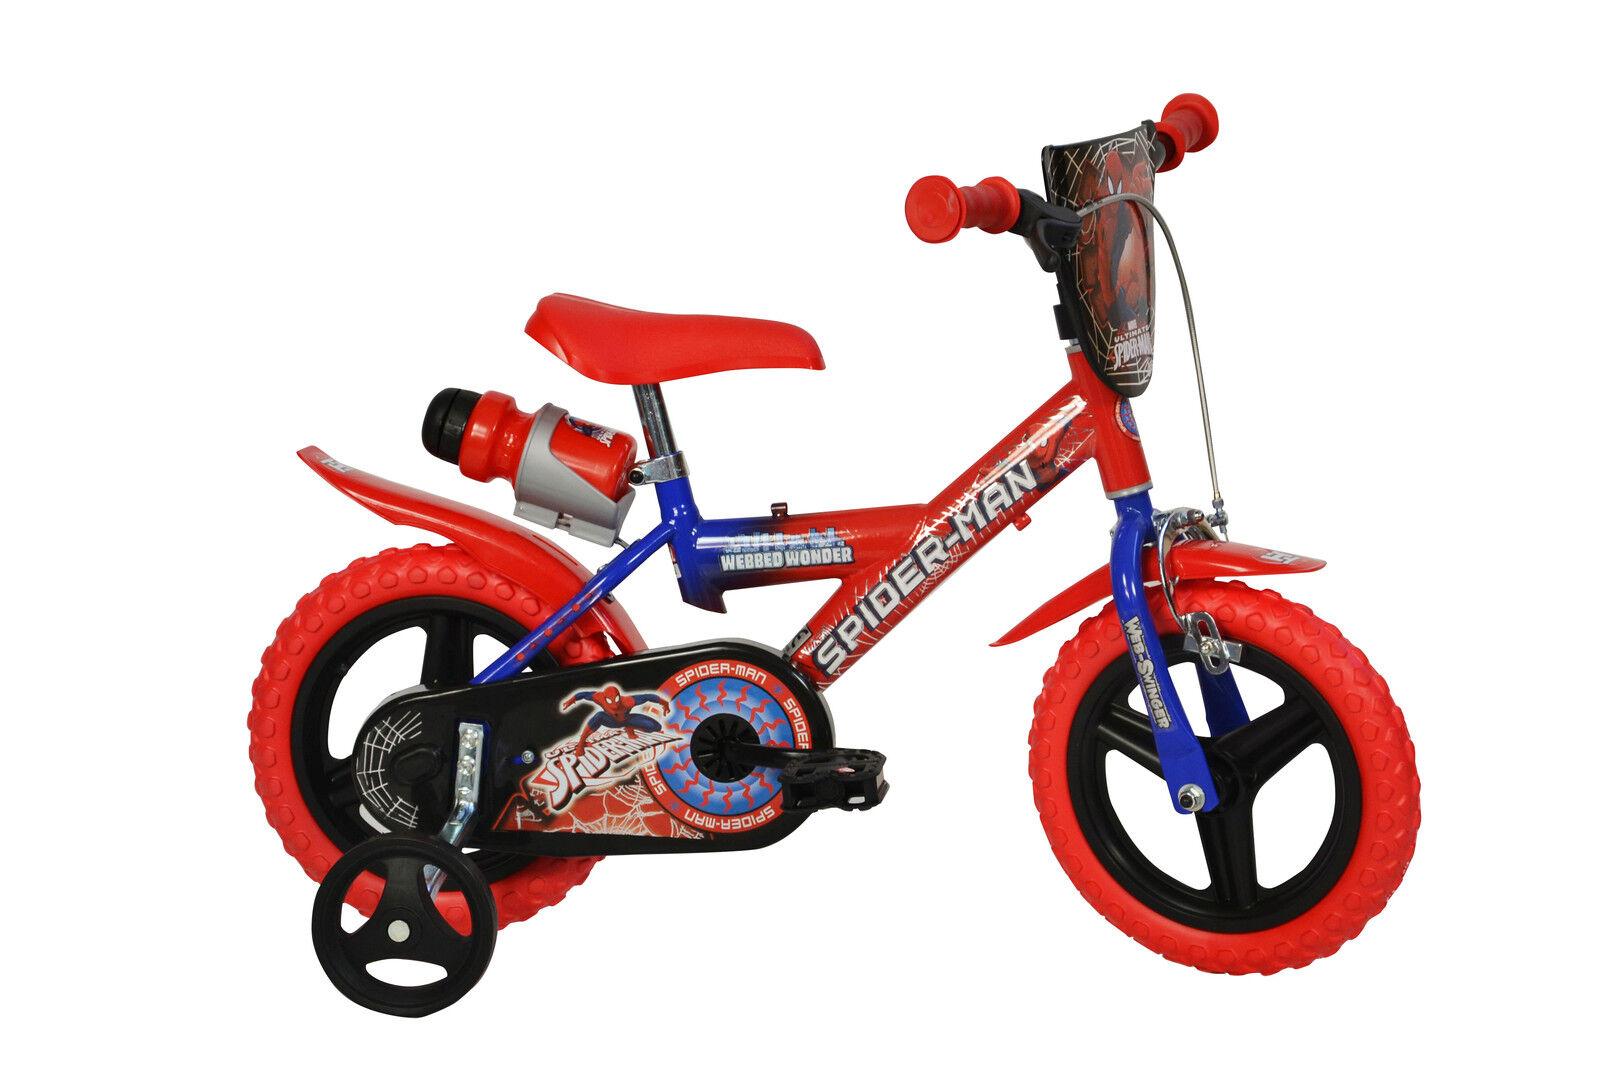 12 Zoll Kinderfahrrad Spiderman Original Original Original Lizenz Kinderrad Fahrrad Spielrad e163b0